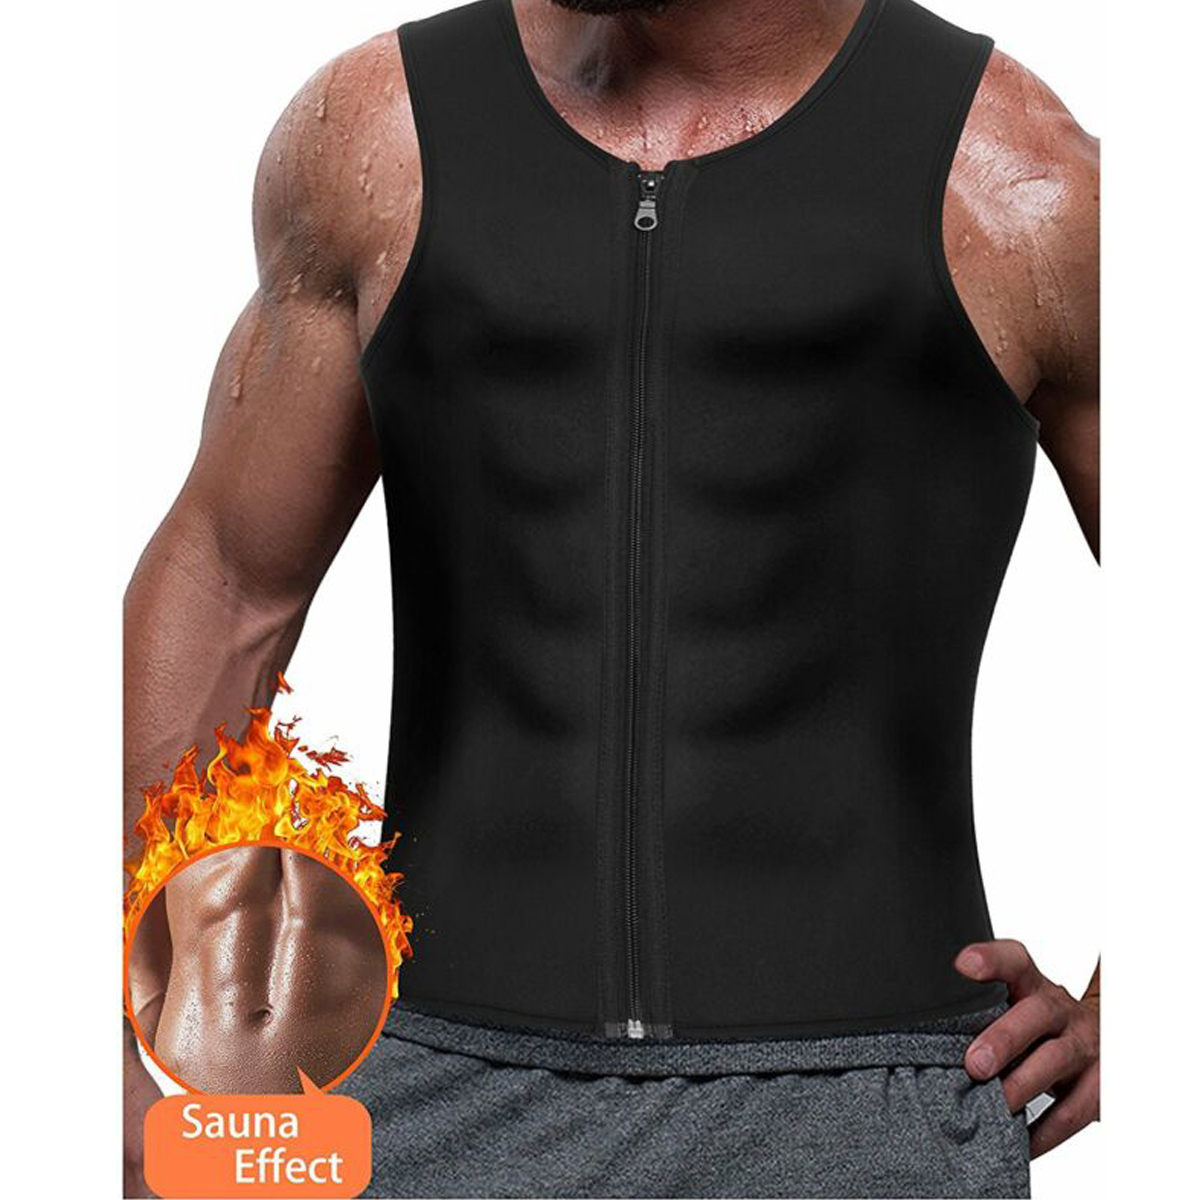 Hot Sweat Vest Neoprene Fat Burning Zipper Body Shapers Weight Loss Shirt for Women